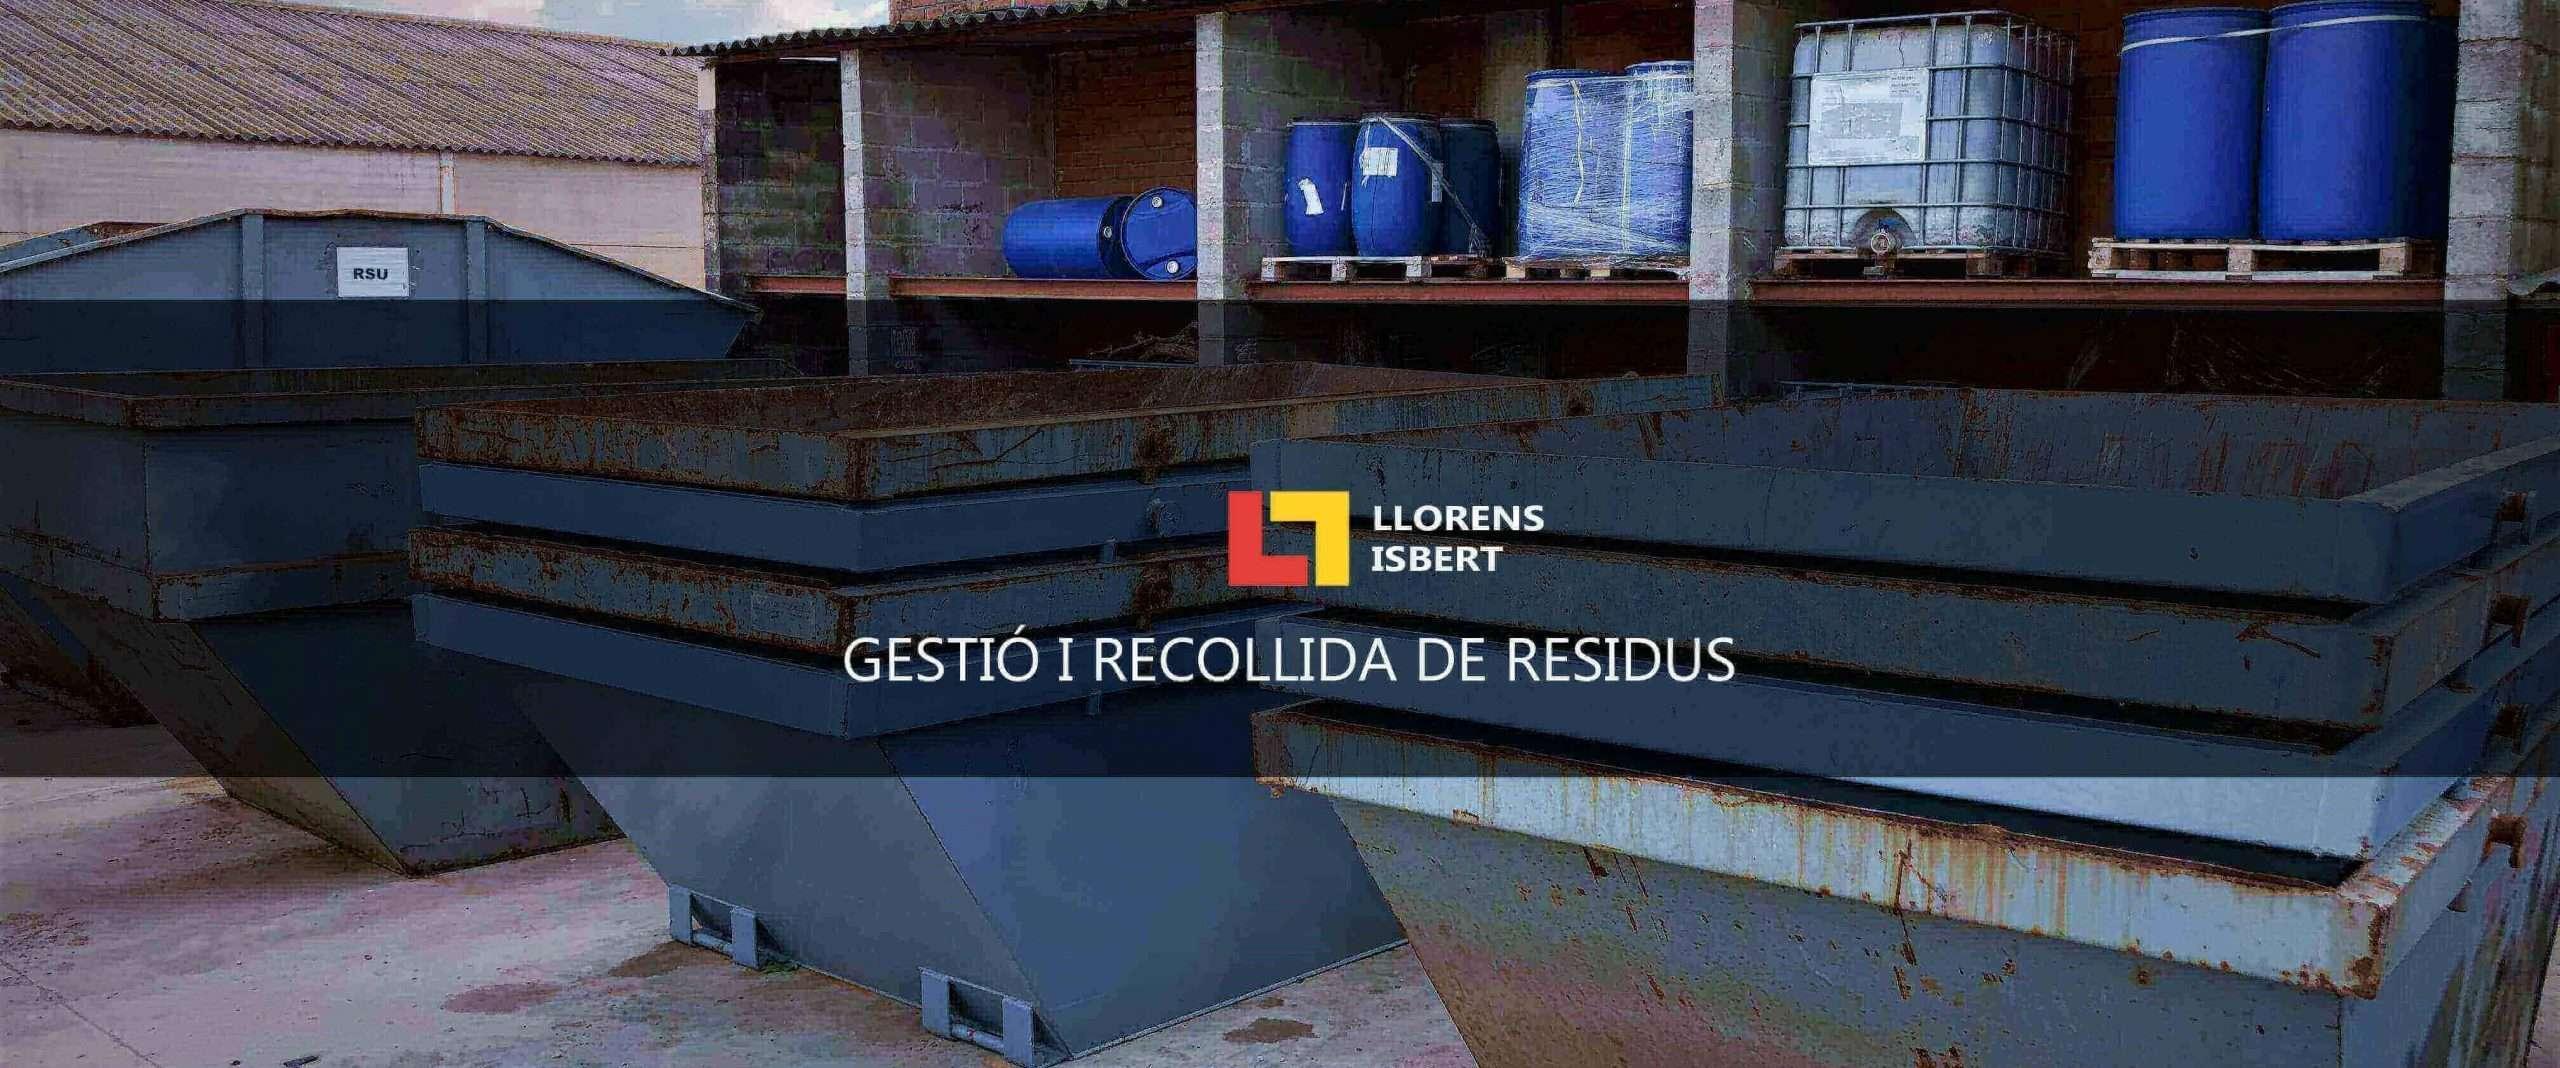 gestió de Residus industrials Igualada